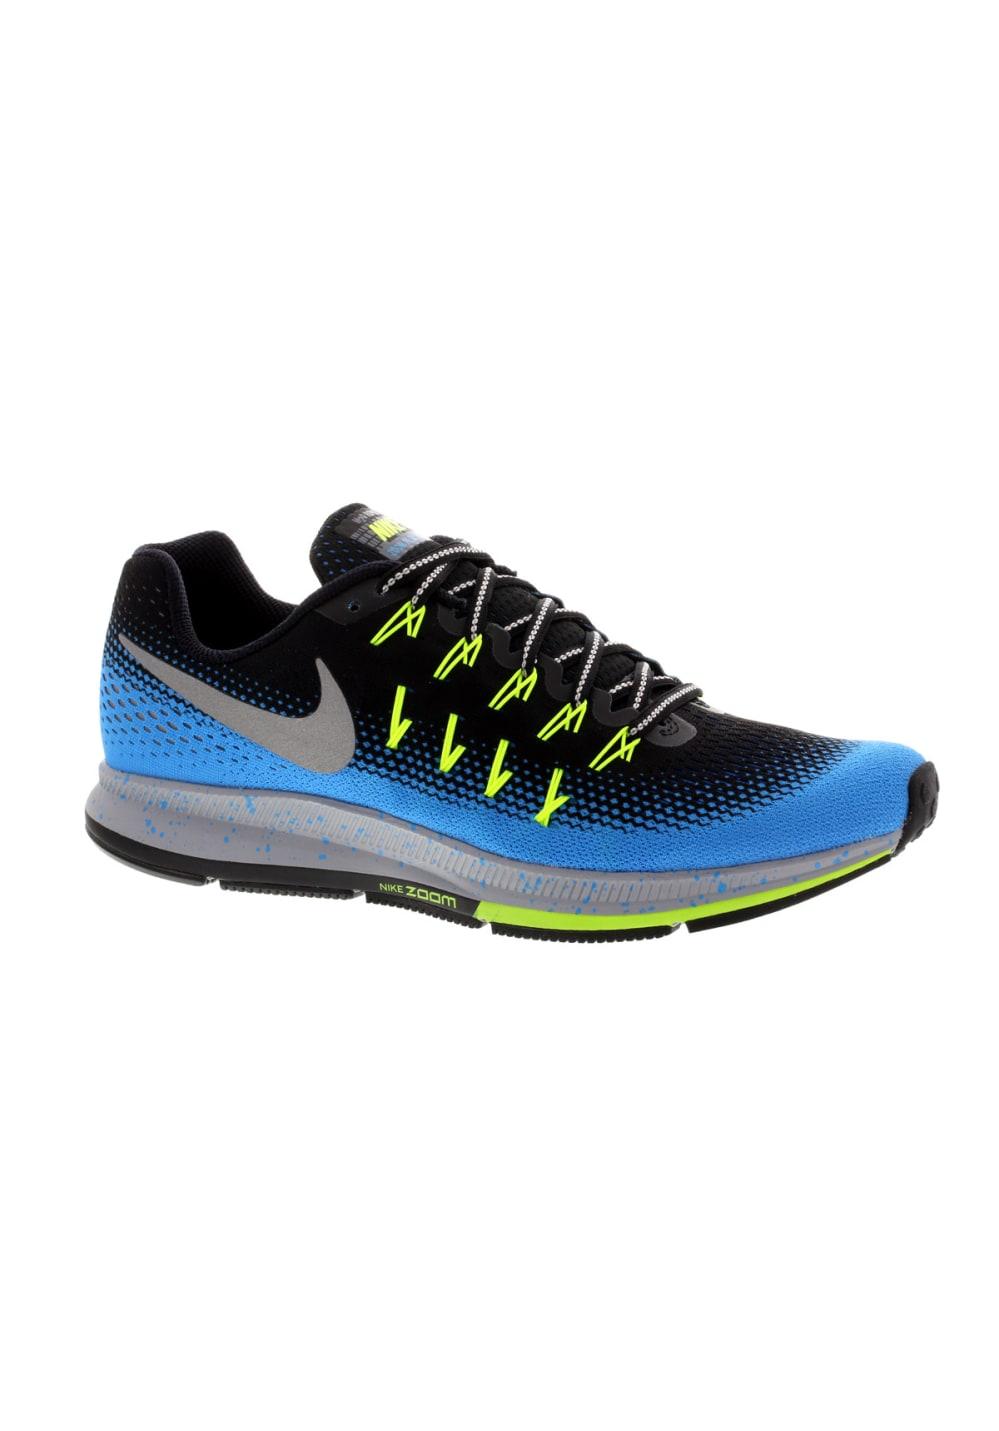 Moda 2019 Nike Air Zoom Pegasus 33 Zapatillas De Running